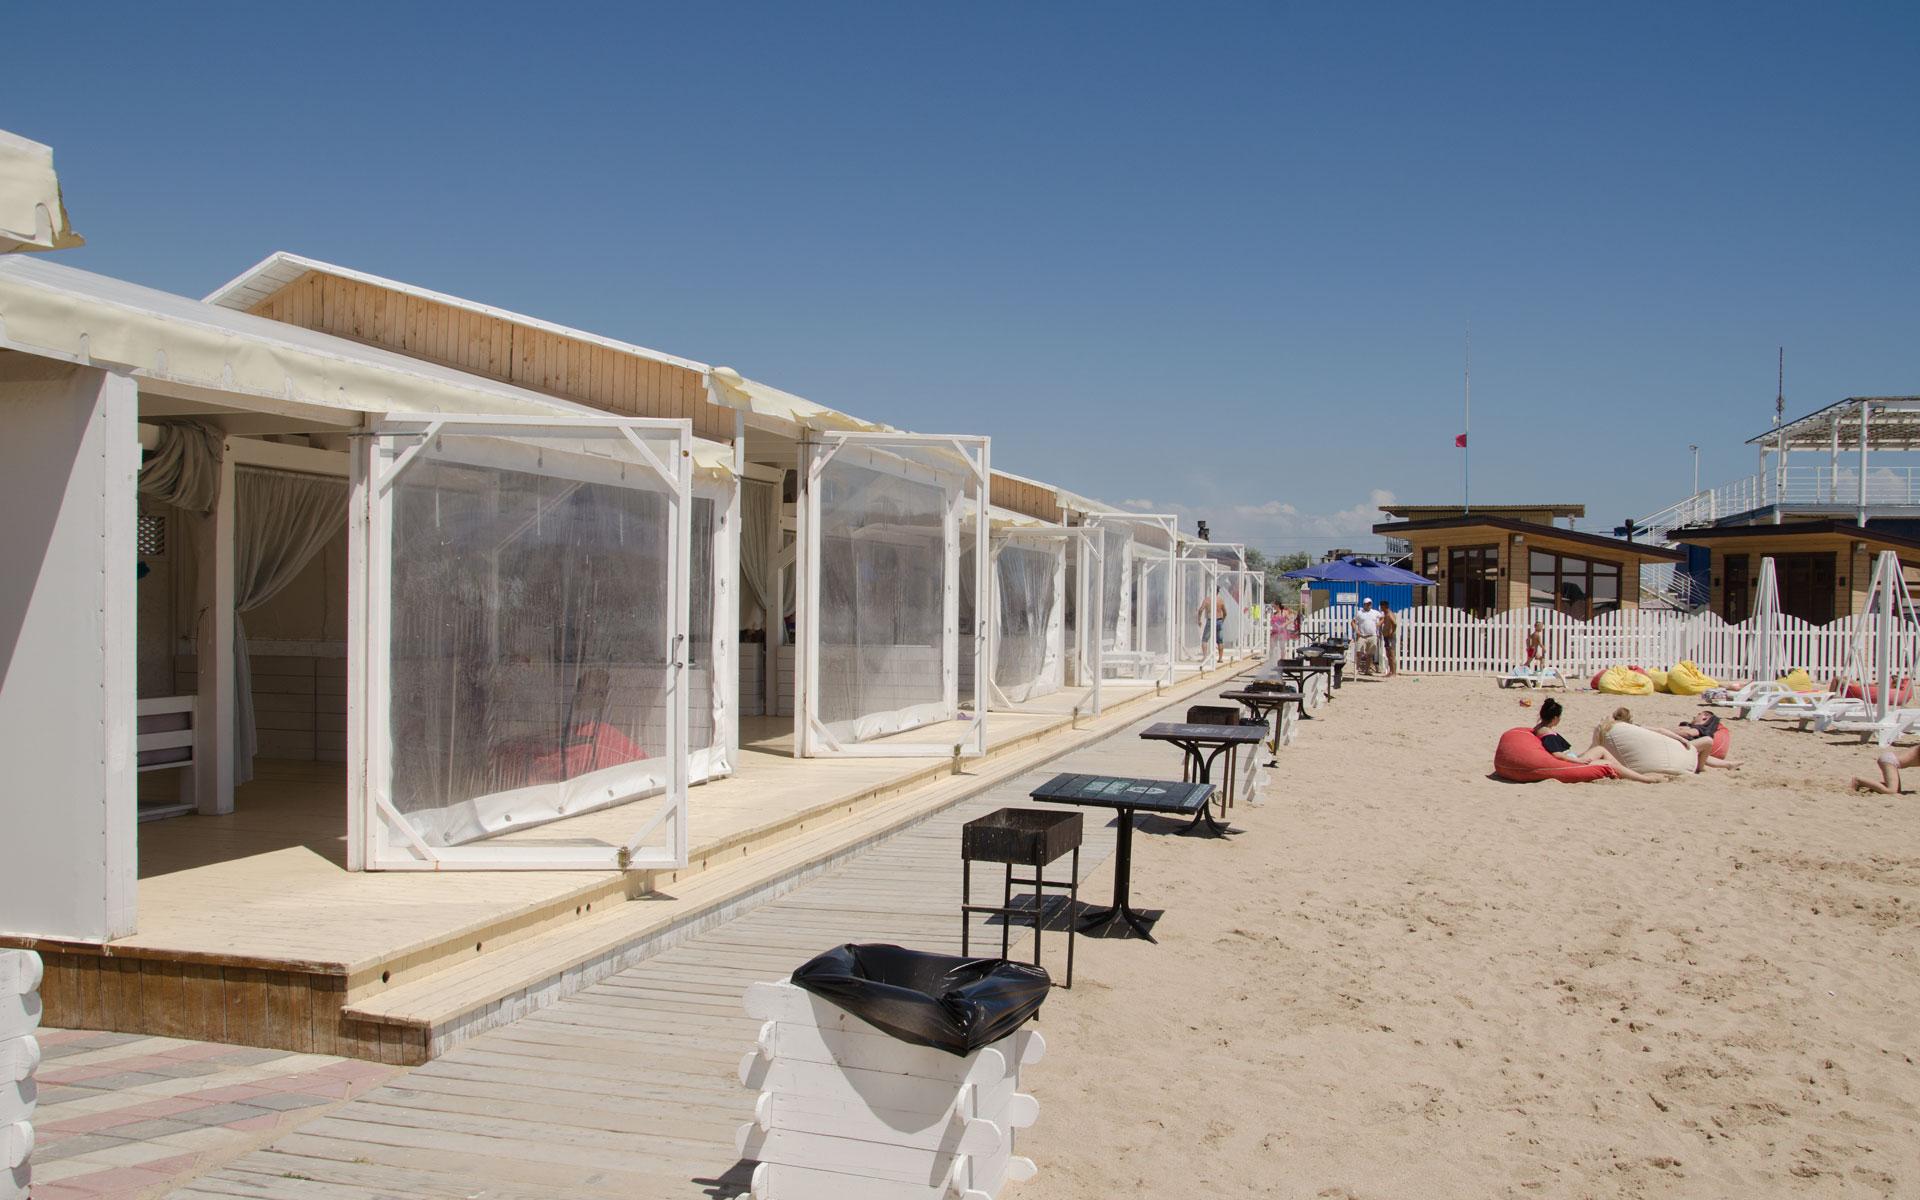 Место с мангалом на пляже. Фото Евпатории